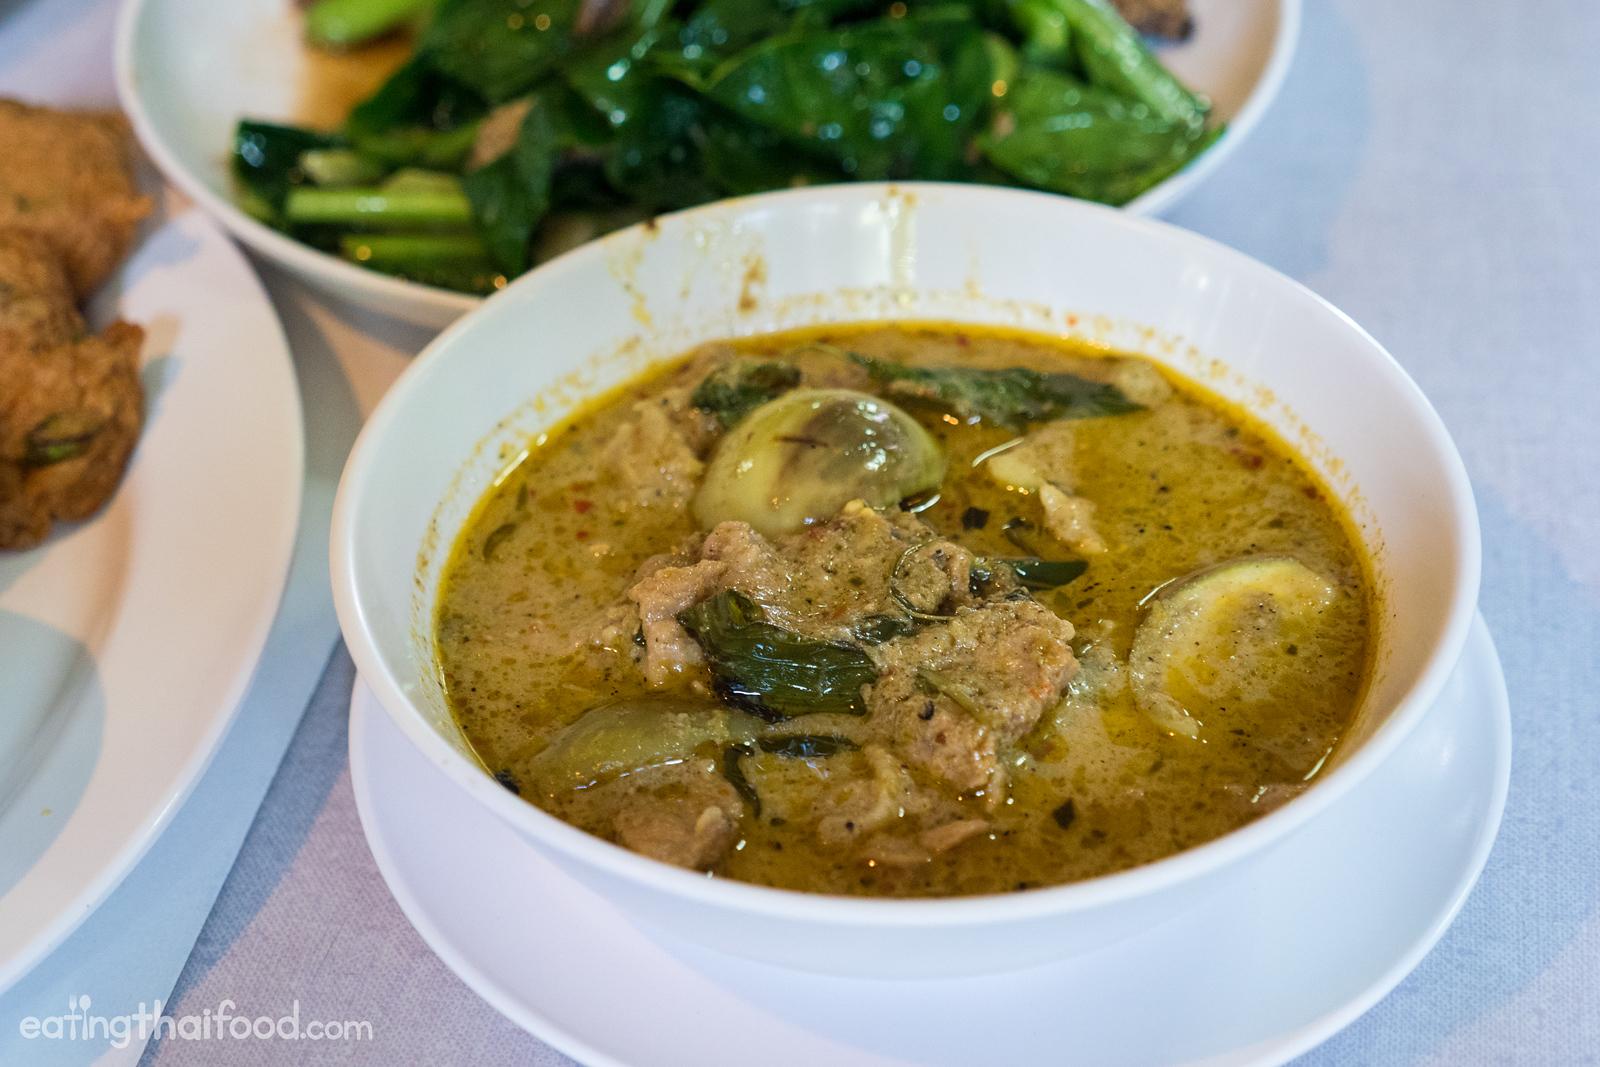 Gaeng keow wan neua (แกงเขียวหวานเนื้อ)